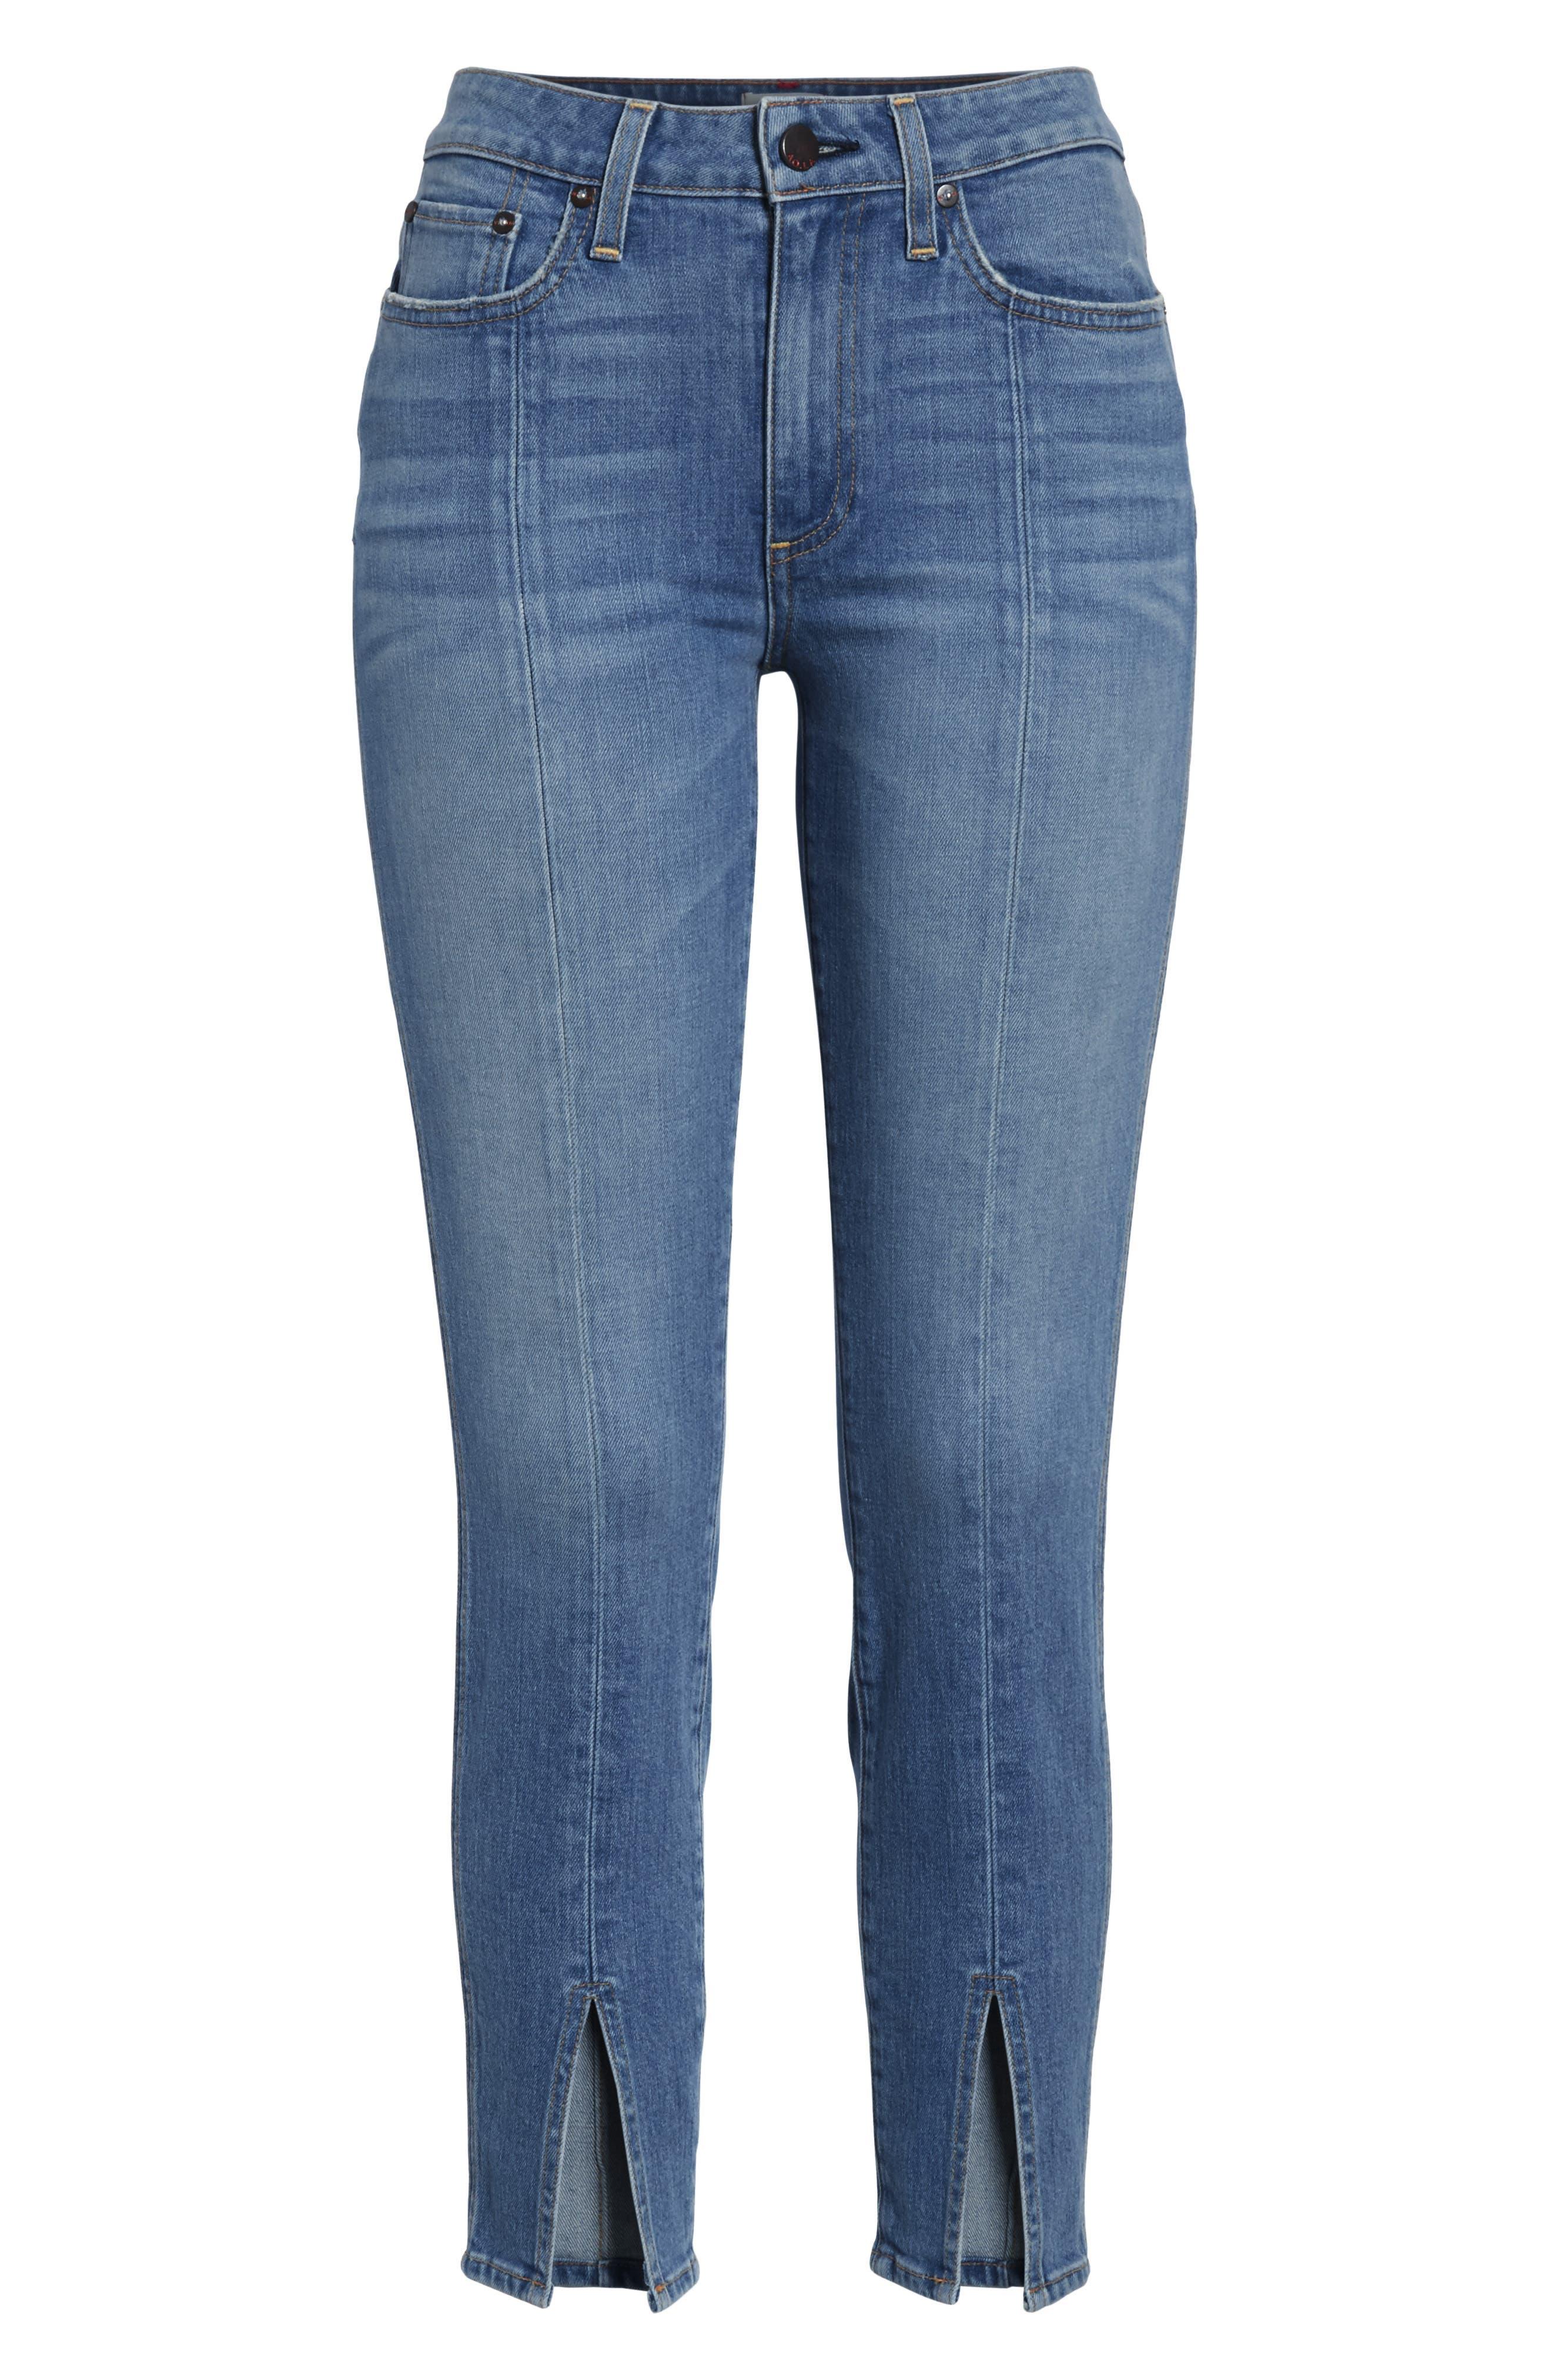 AO.LA Good Ankle Skinny Jeans,                             Alternate thumbnail 6, color,                             Sweet Emotion